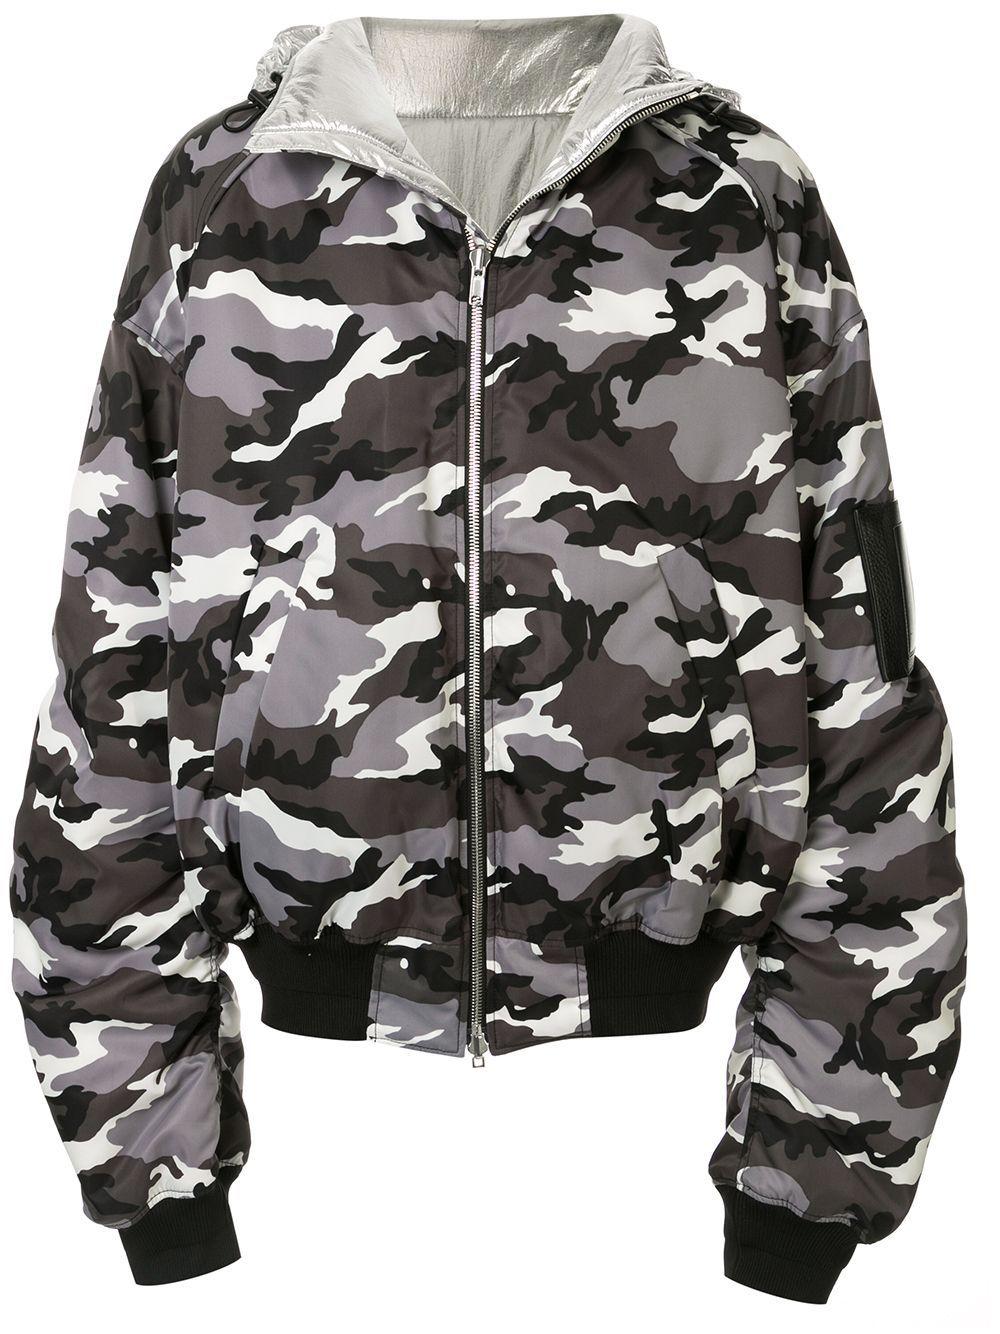 Juun J Camouflage Print Hooded Bomber Jacket Farfetch Hooded Bomber Jacket Bomber Jacket Black Bomber Jacket [ 1334 x 1000 Pixel ]